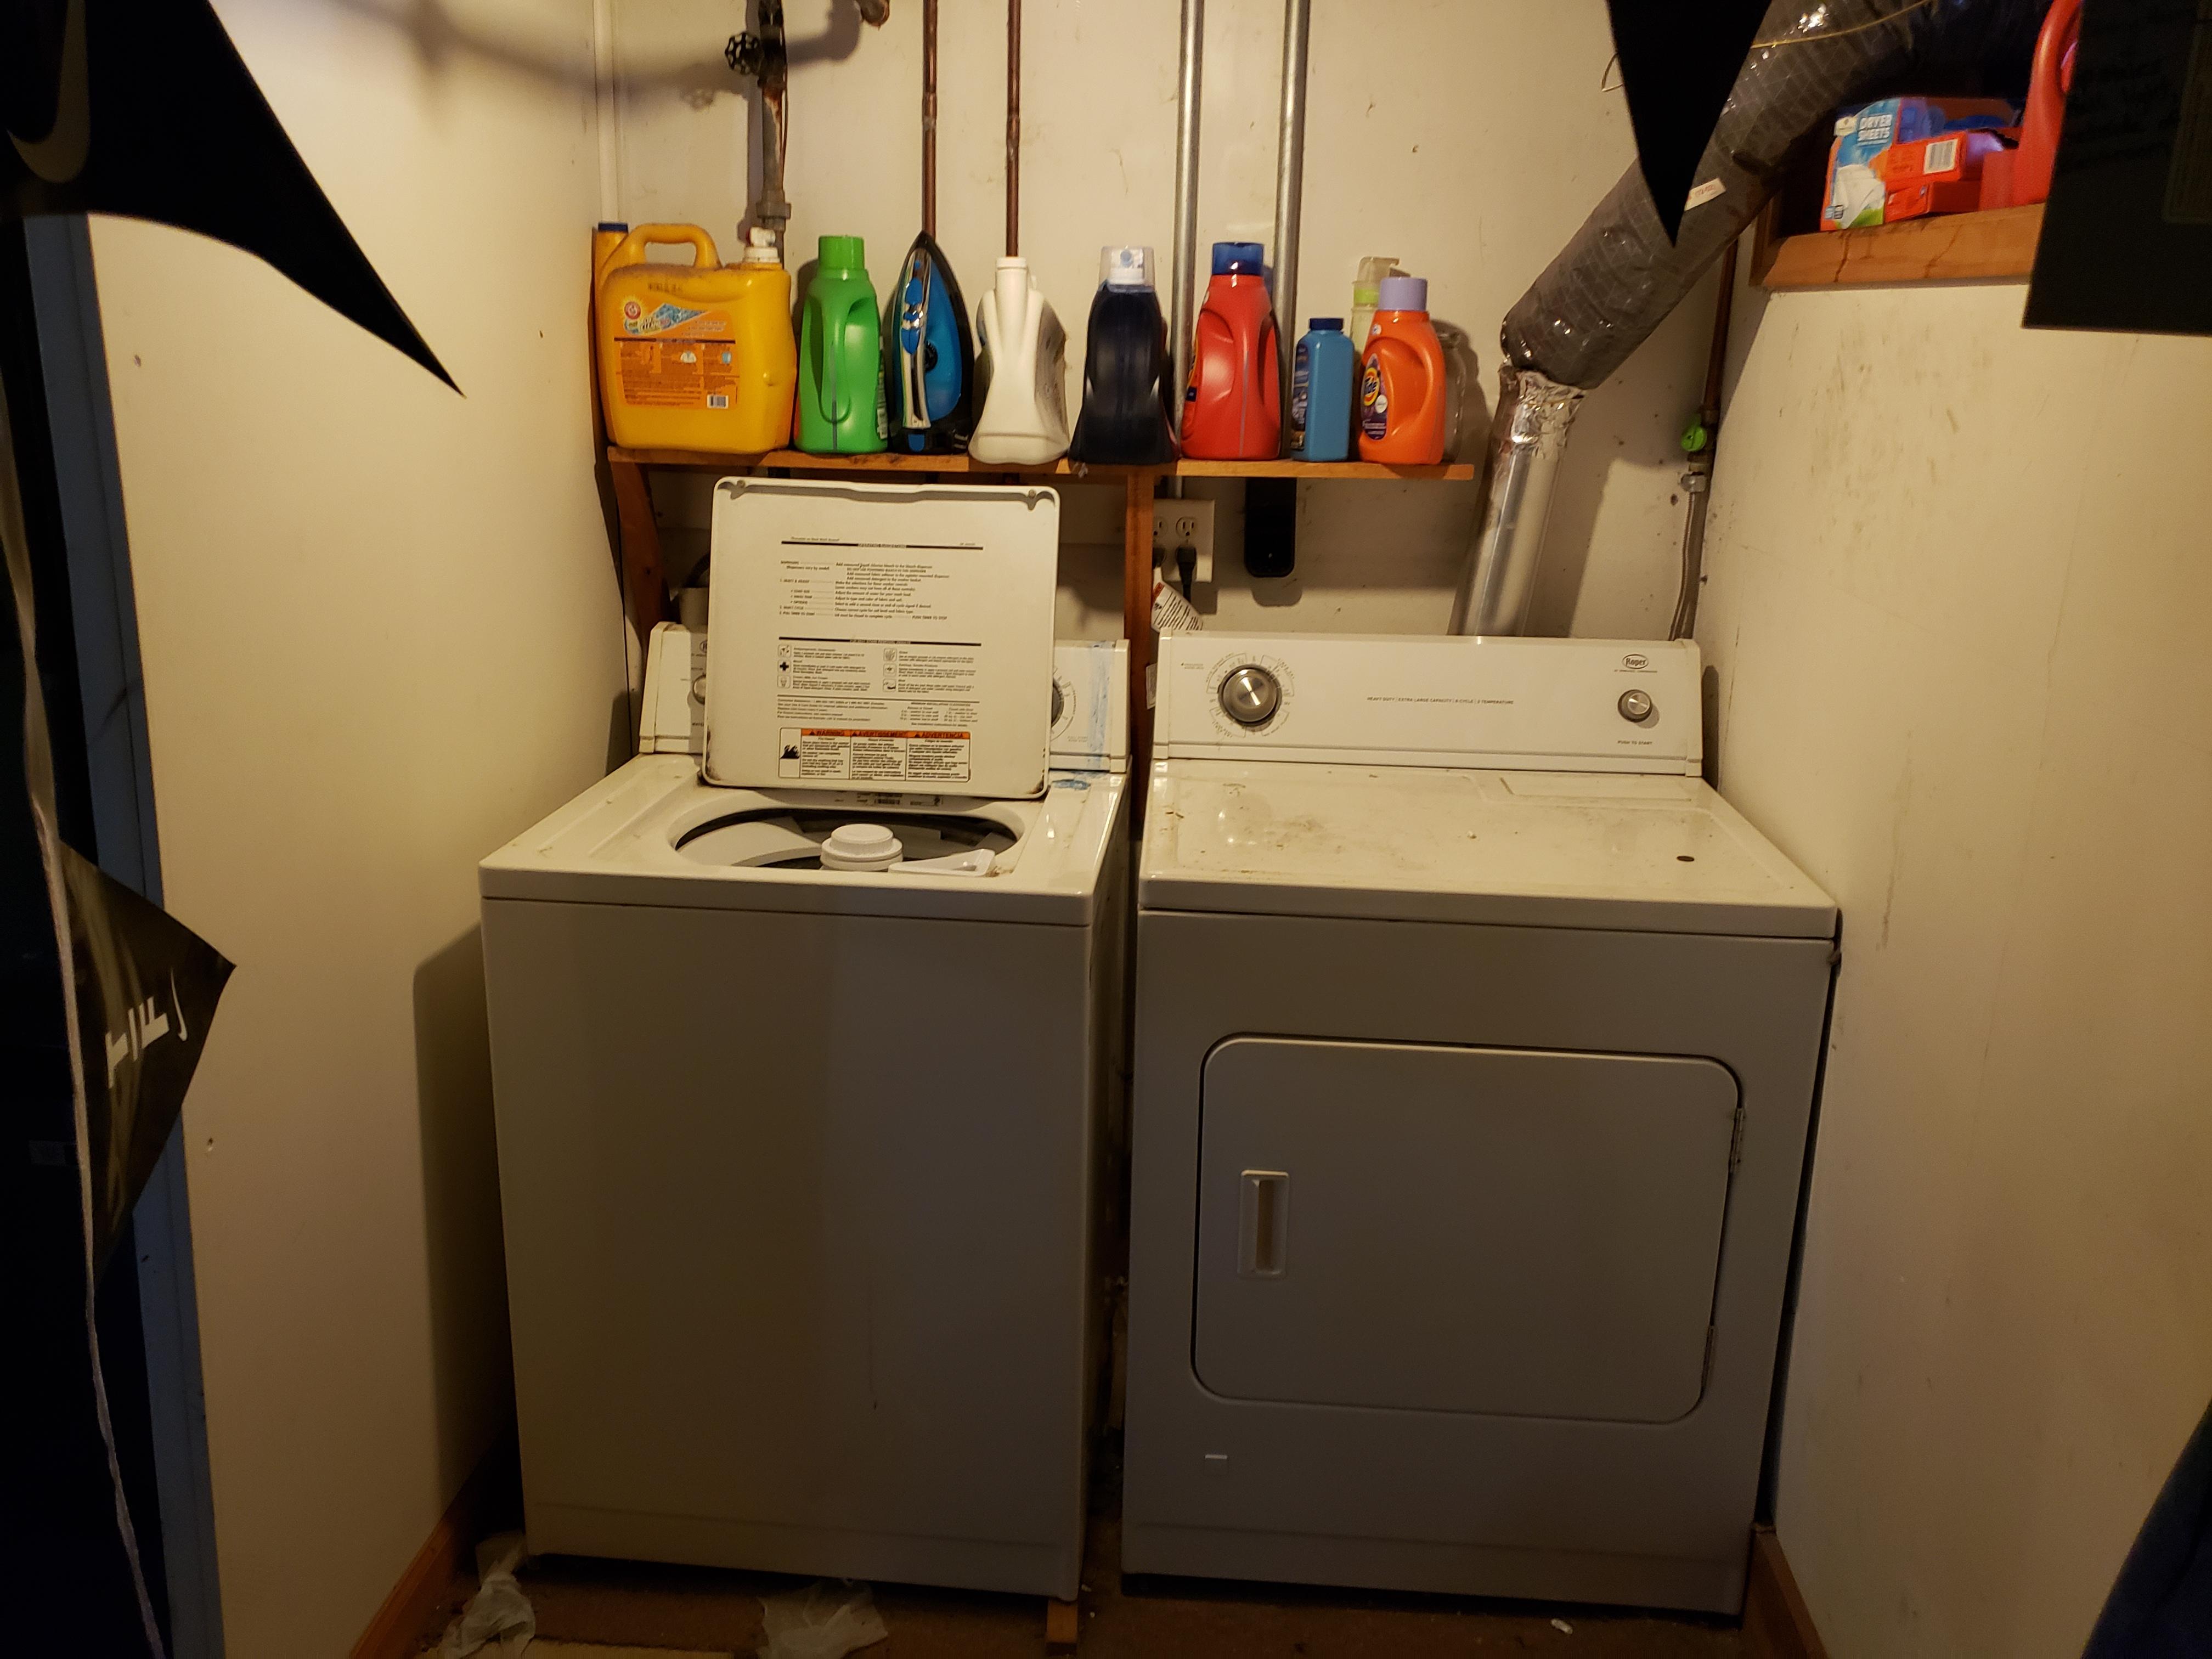 125 - 1649 Laundry